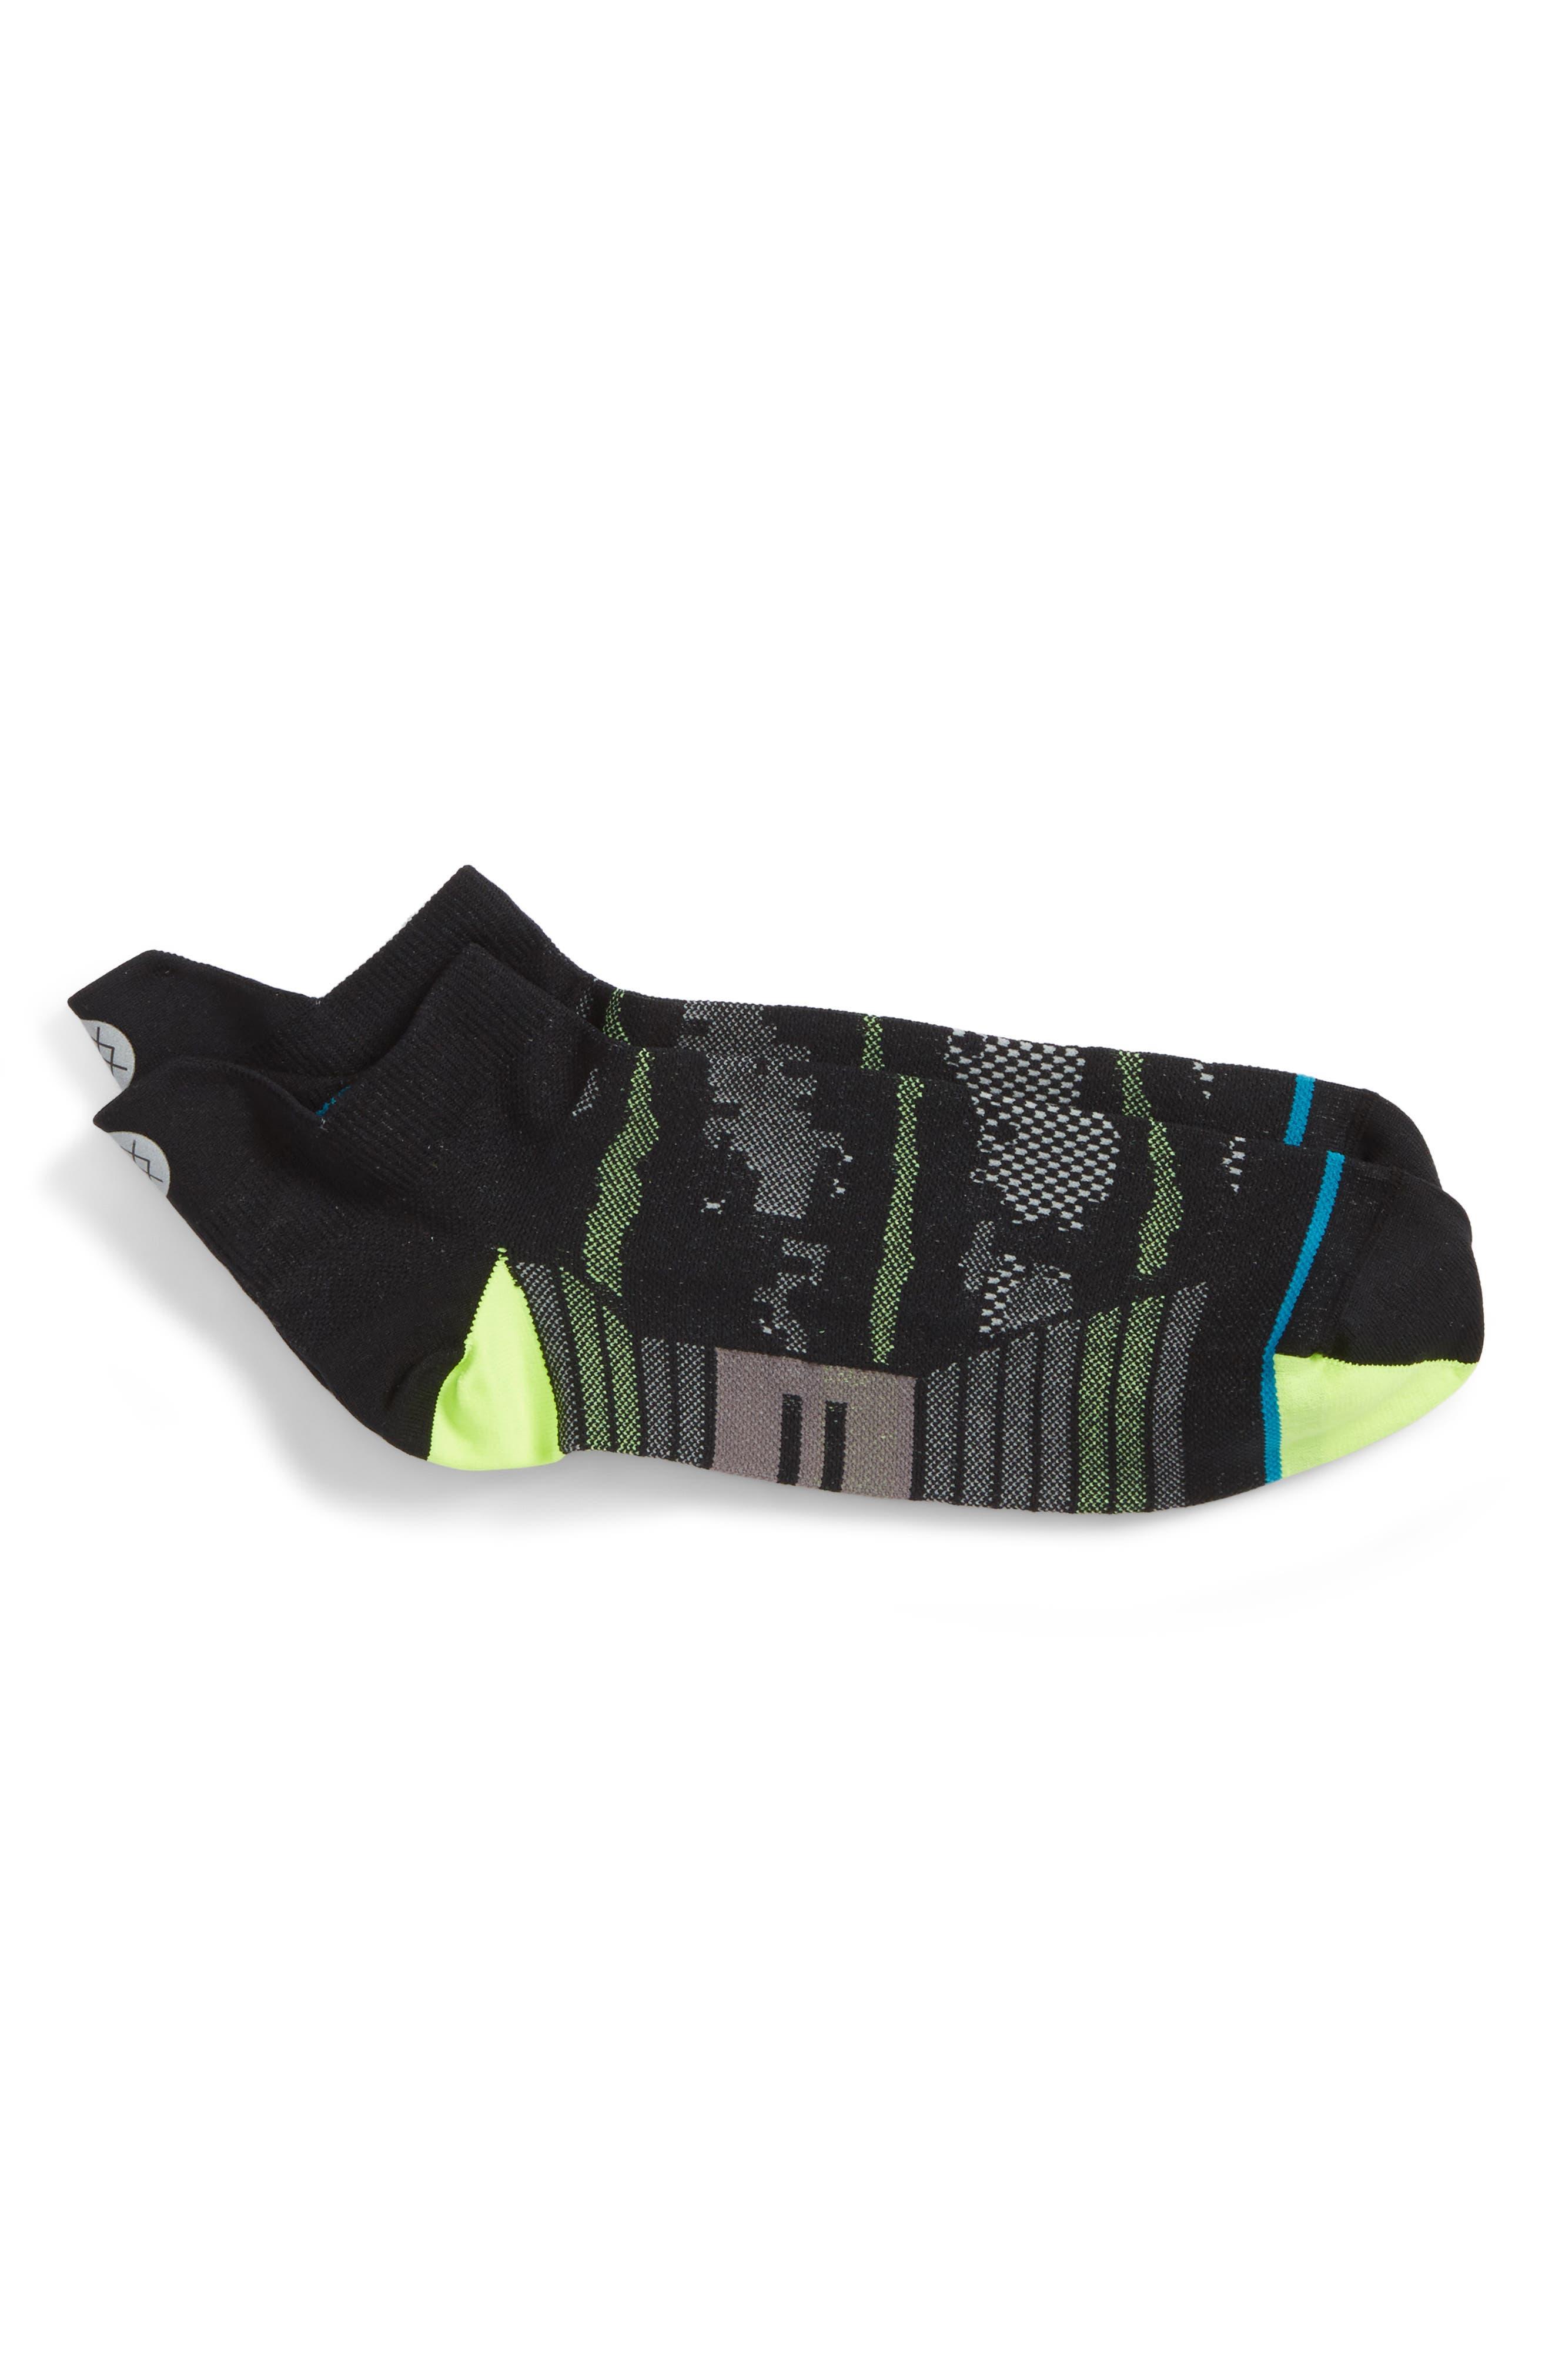 Night Light Tab Socks,                         Main,                         color, 001